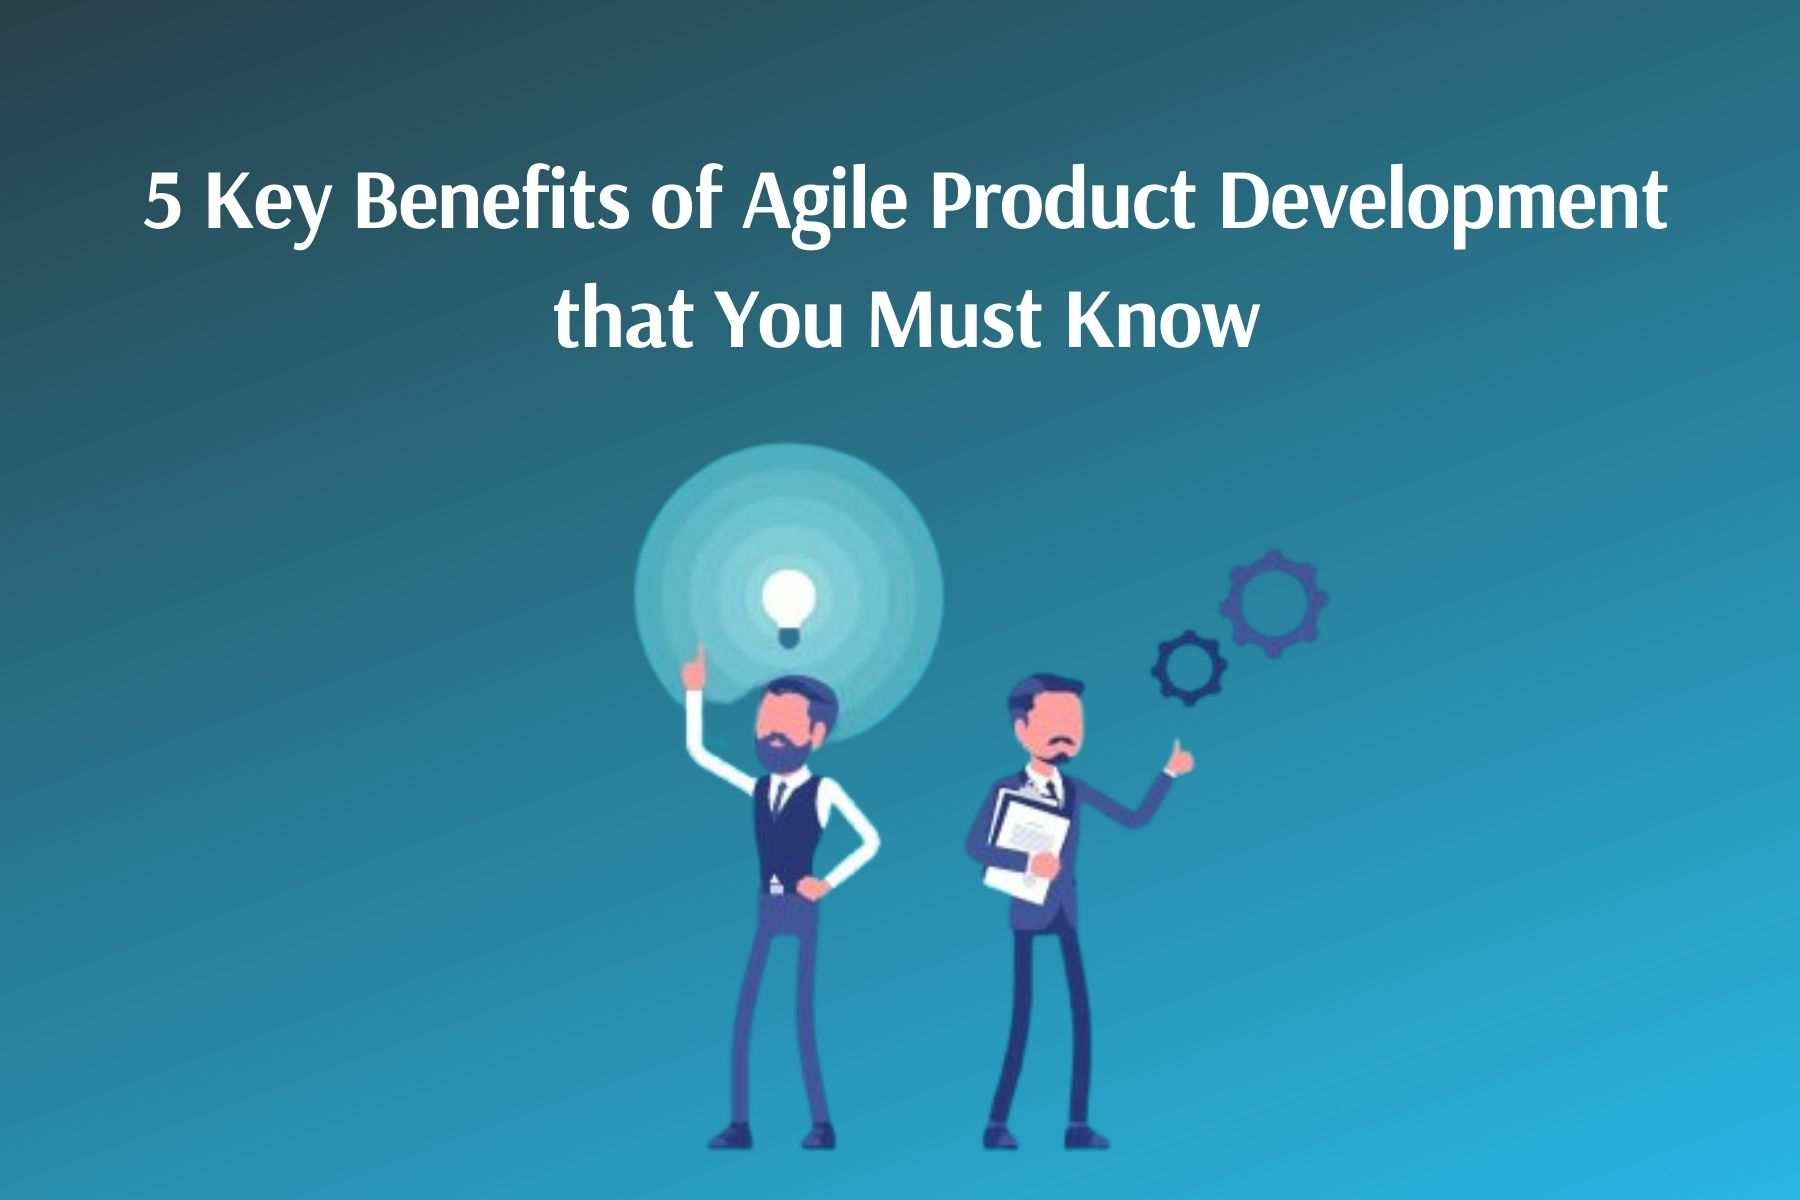 Benefits of Agile Product Development